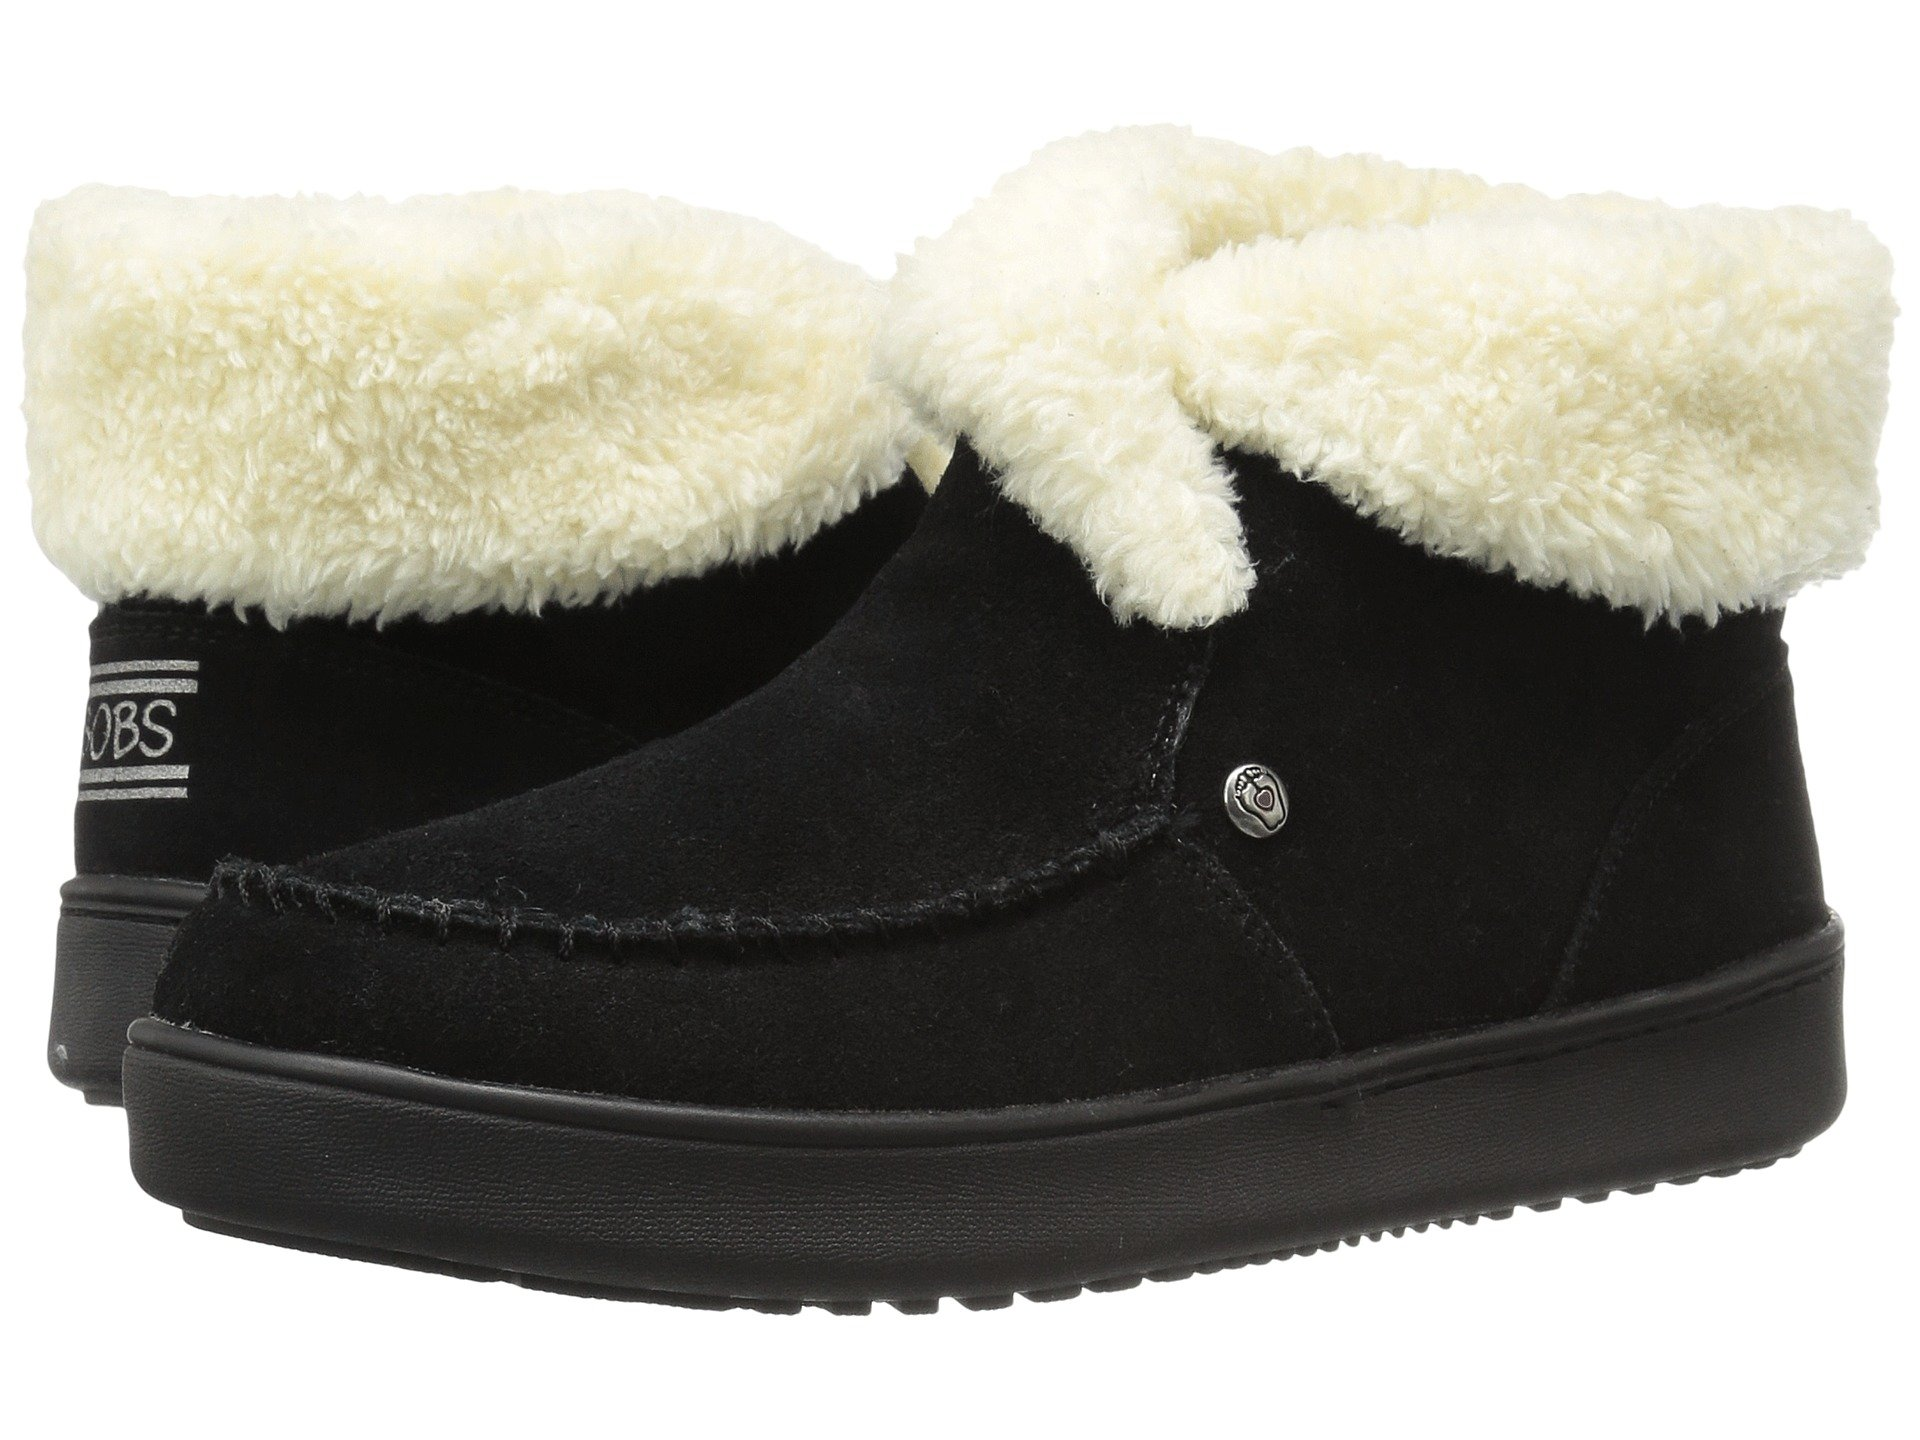 Zapato de Descanso para Mujer BOBS from SKECHERS Cozy High - Mittens  + SKECHERS en VeoyCompro.net